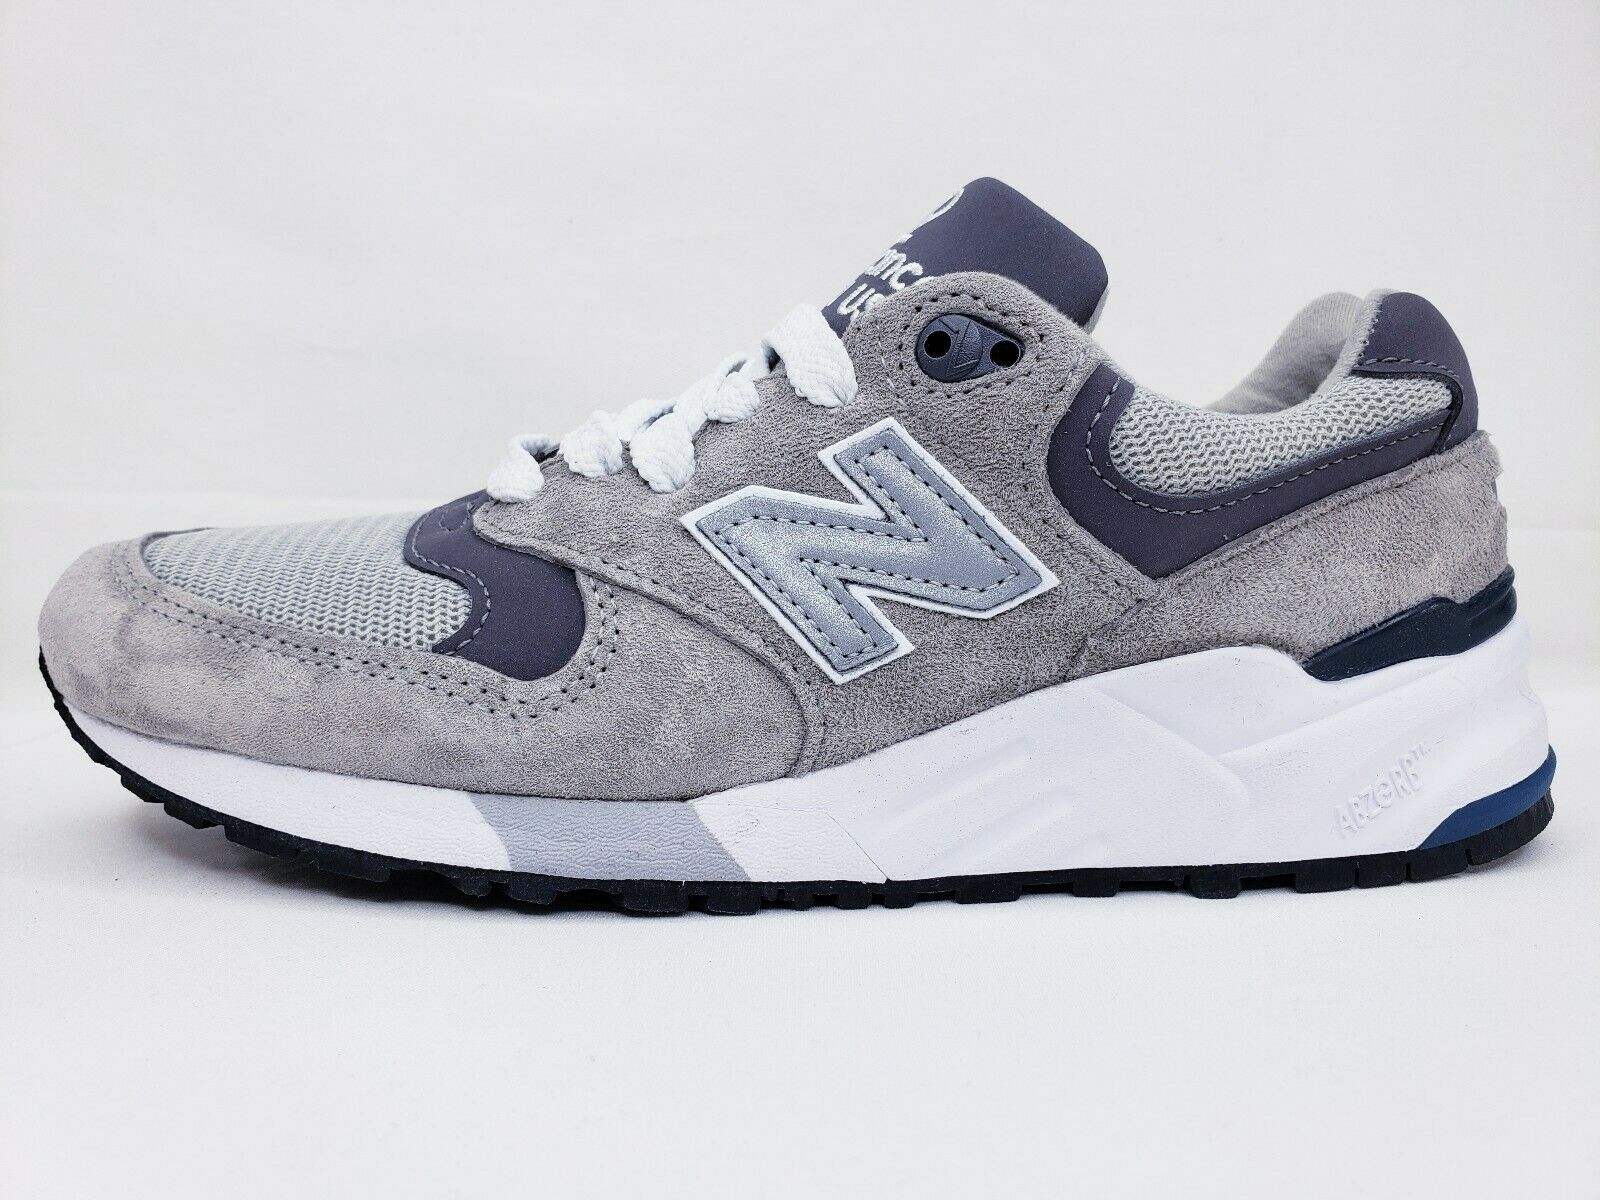 New Balance 999 M999CGL Grey Pewter Running shoes